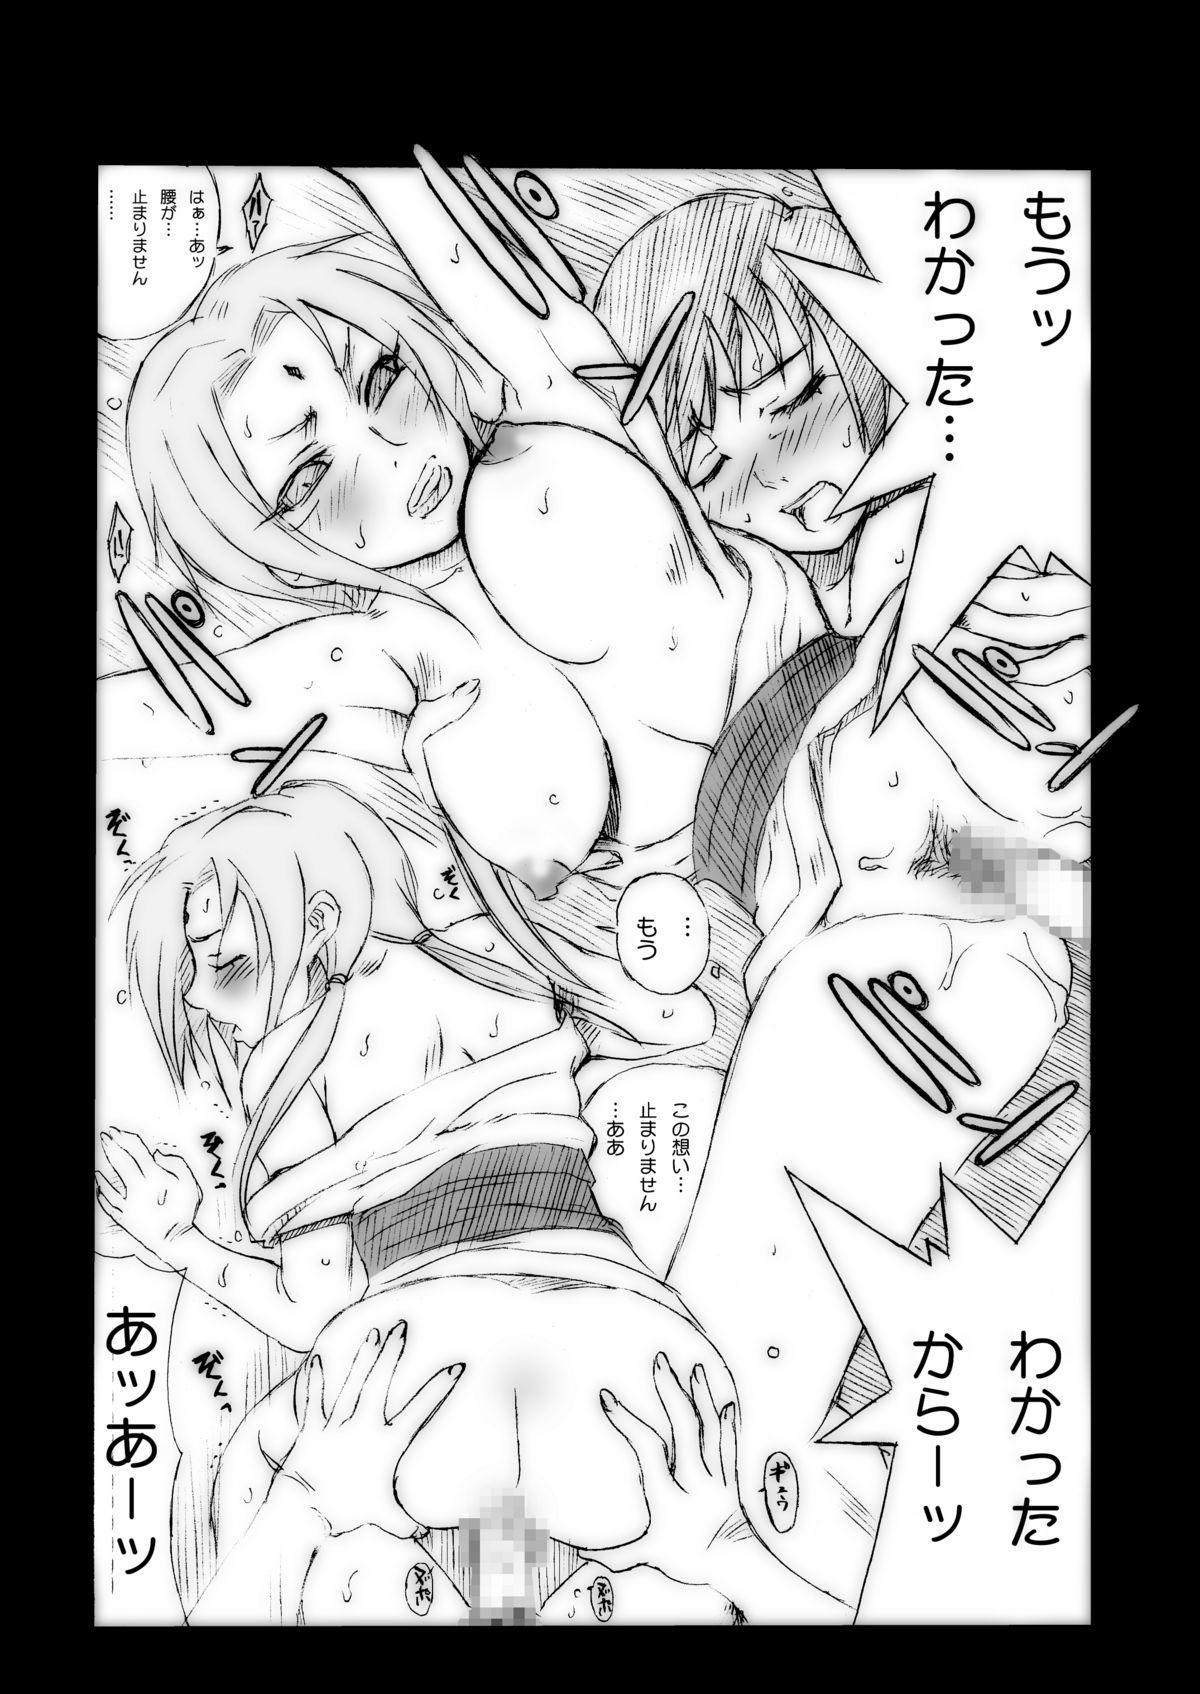 [MG WORKS (Isou Doubaku) Q.N.T DL (Naruto) [Digital] 58